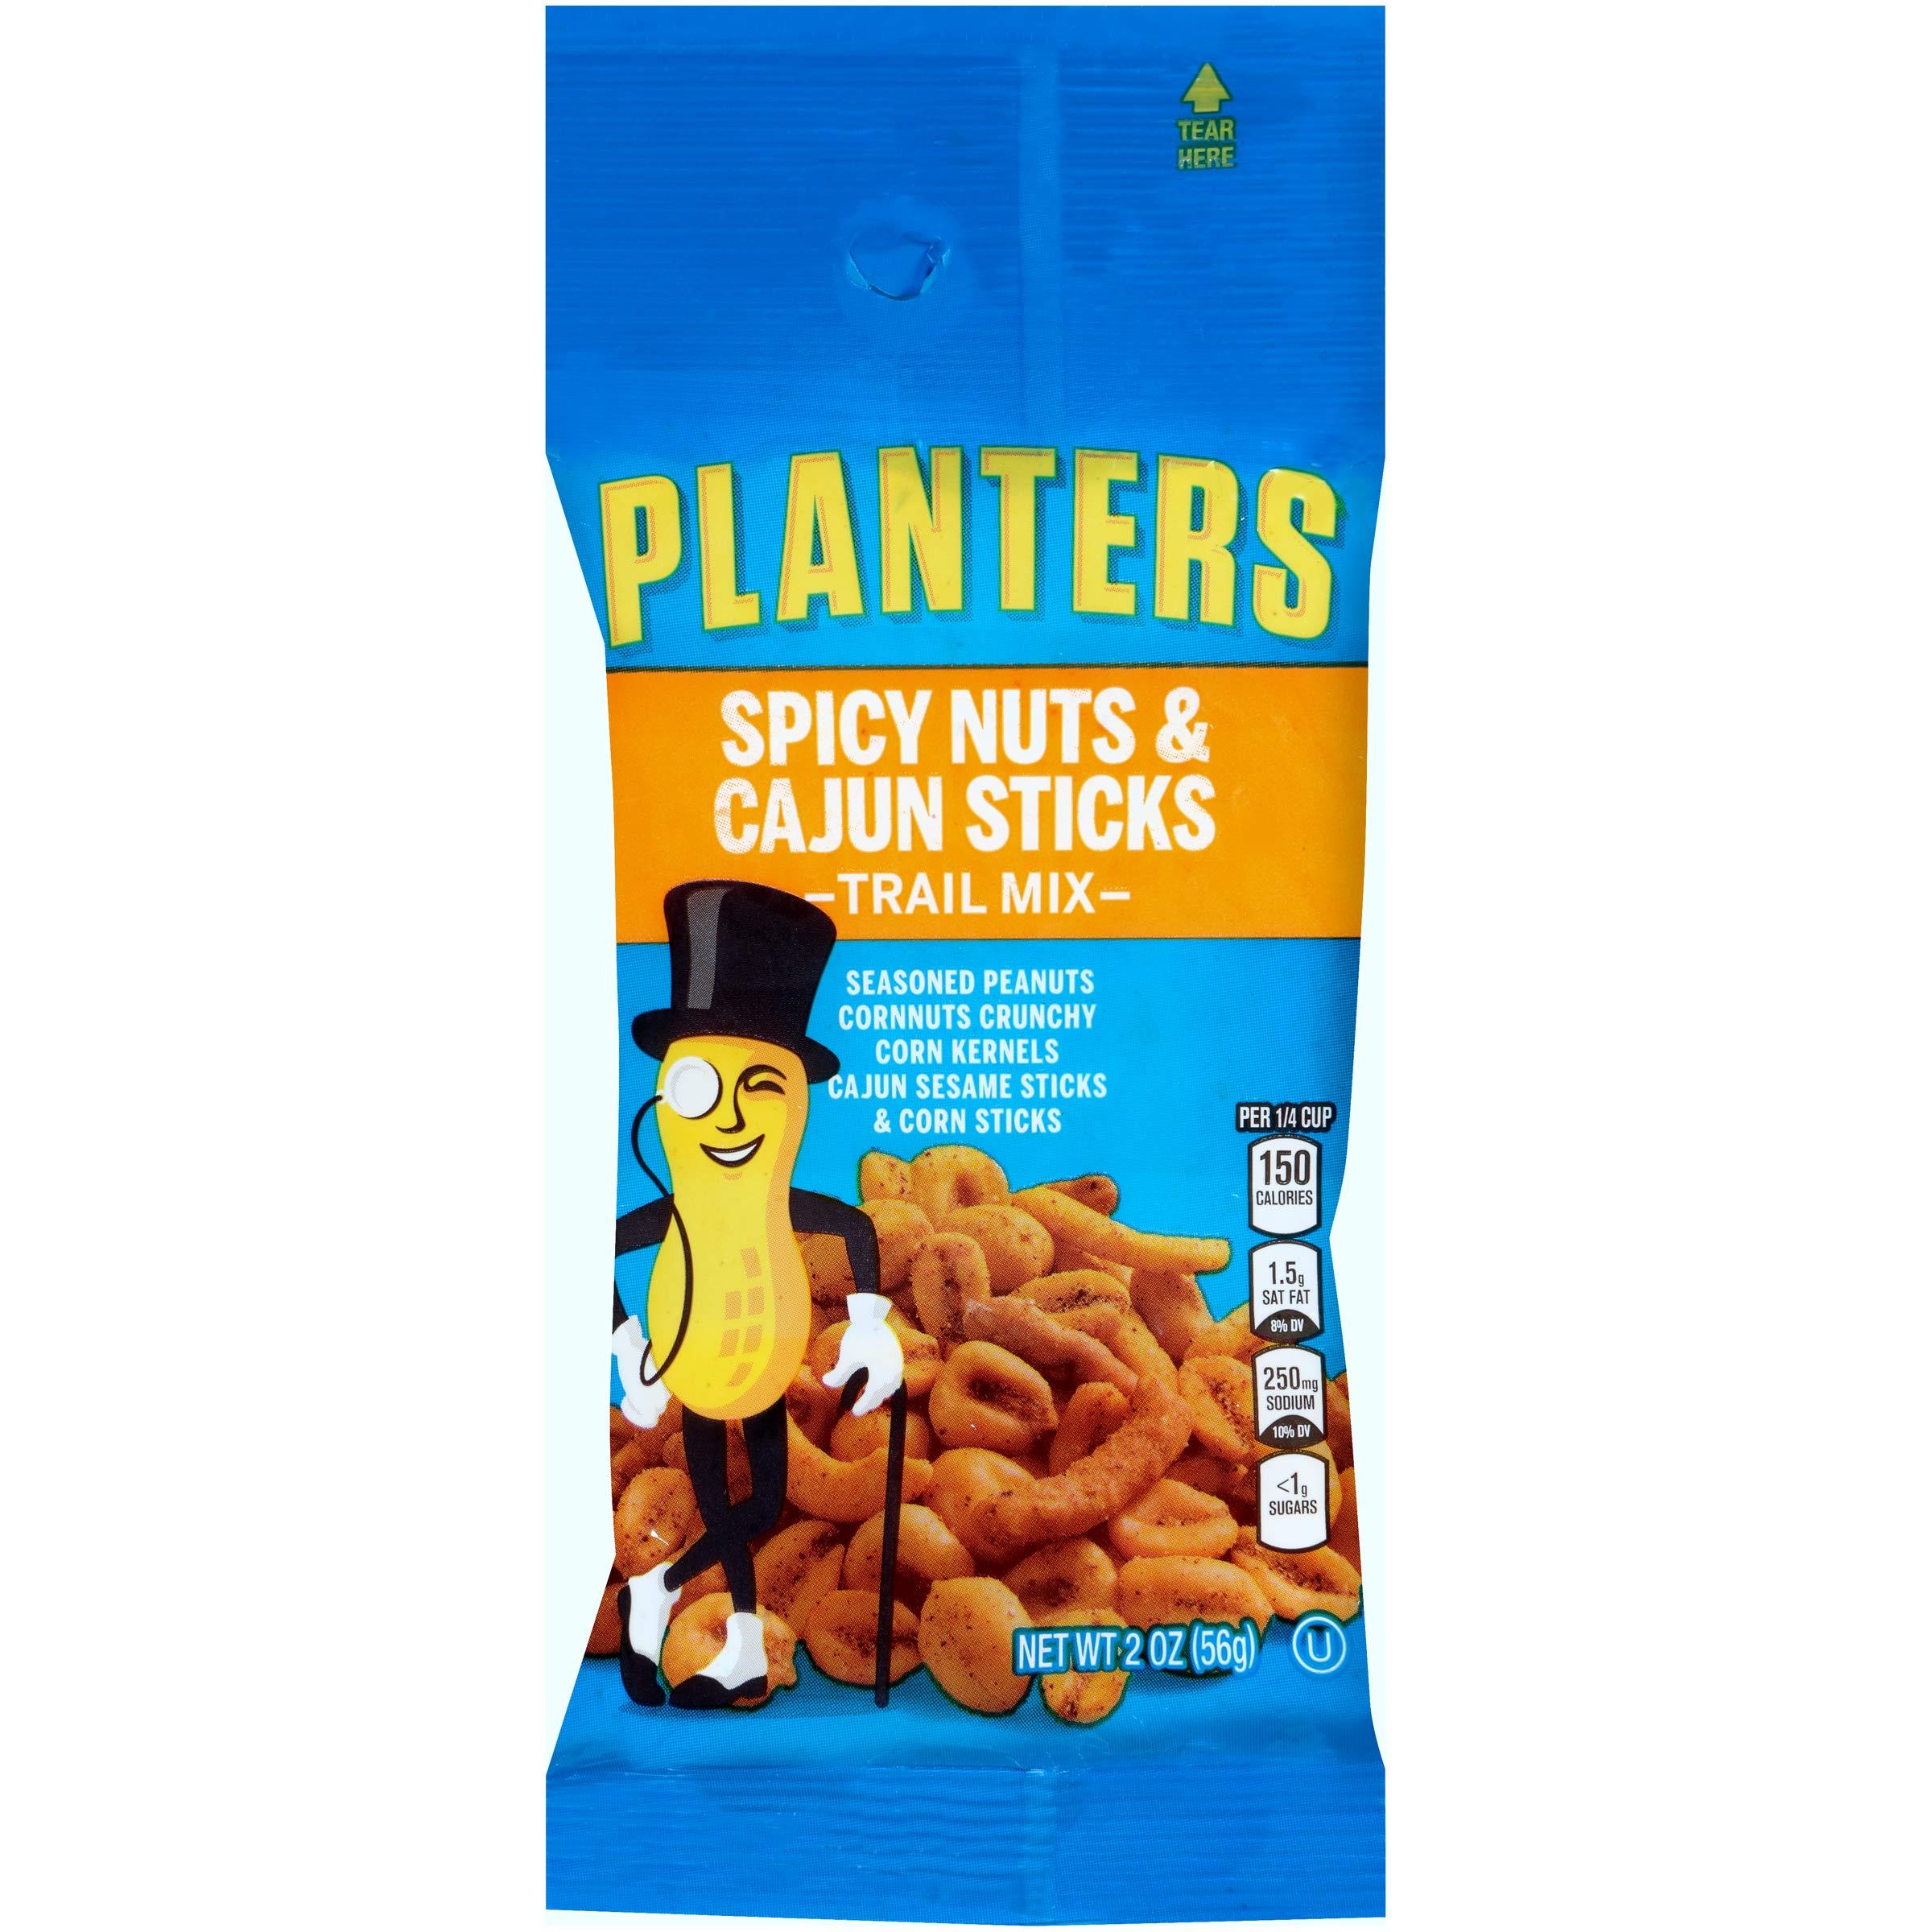 Planters Spicy Nuts & Cajun Sticks Trail Mix, 2 oz Bag (Pack of 72)